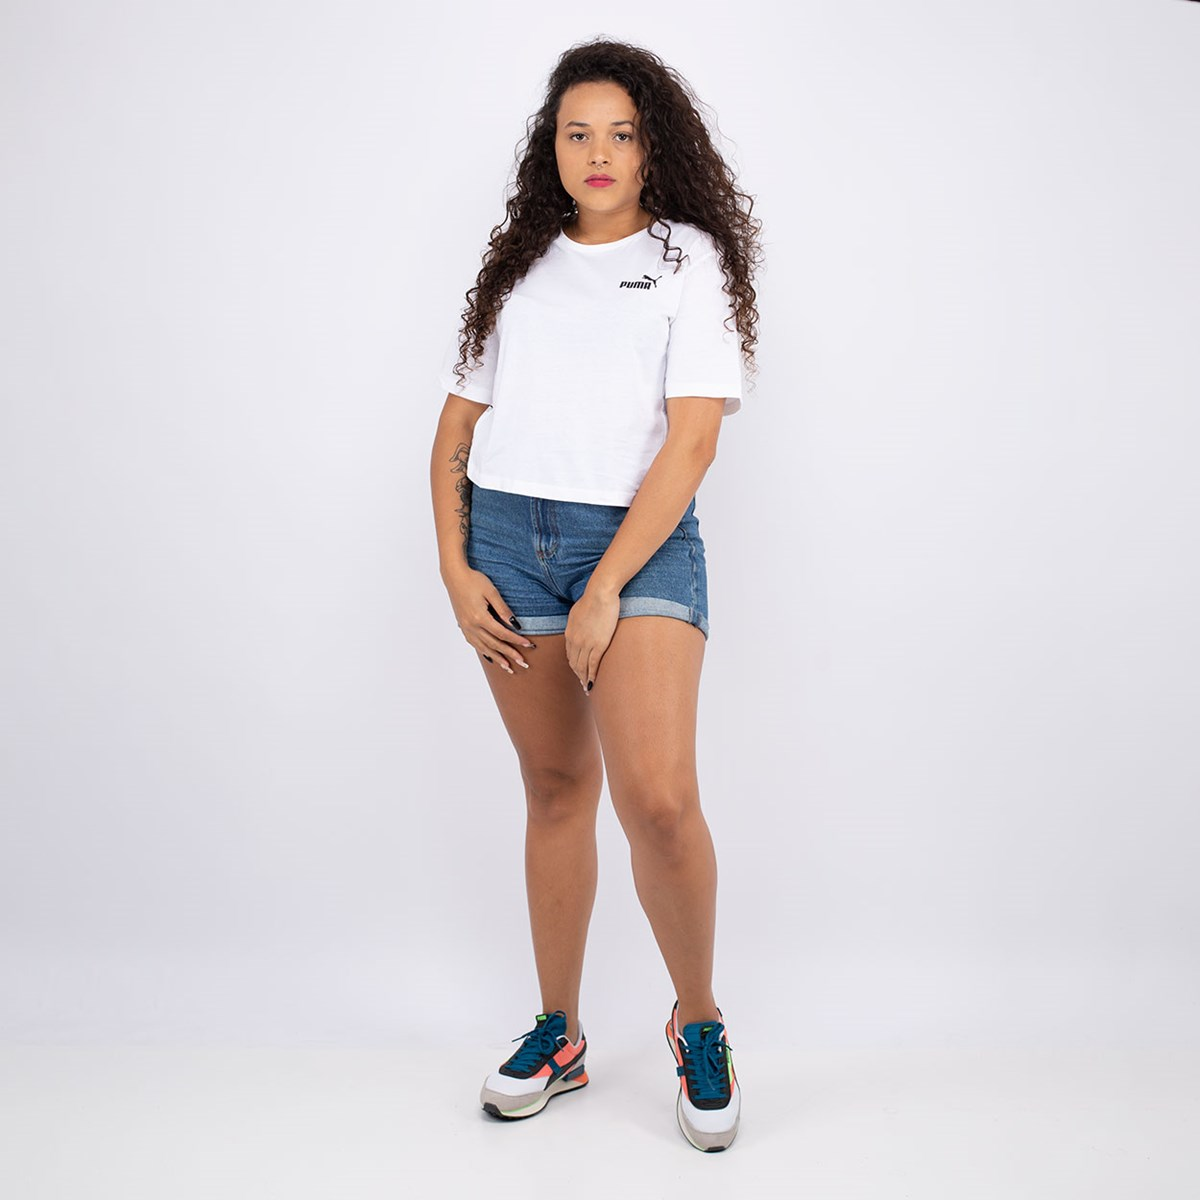 Camiseta Puma Amplified White 583609-02